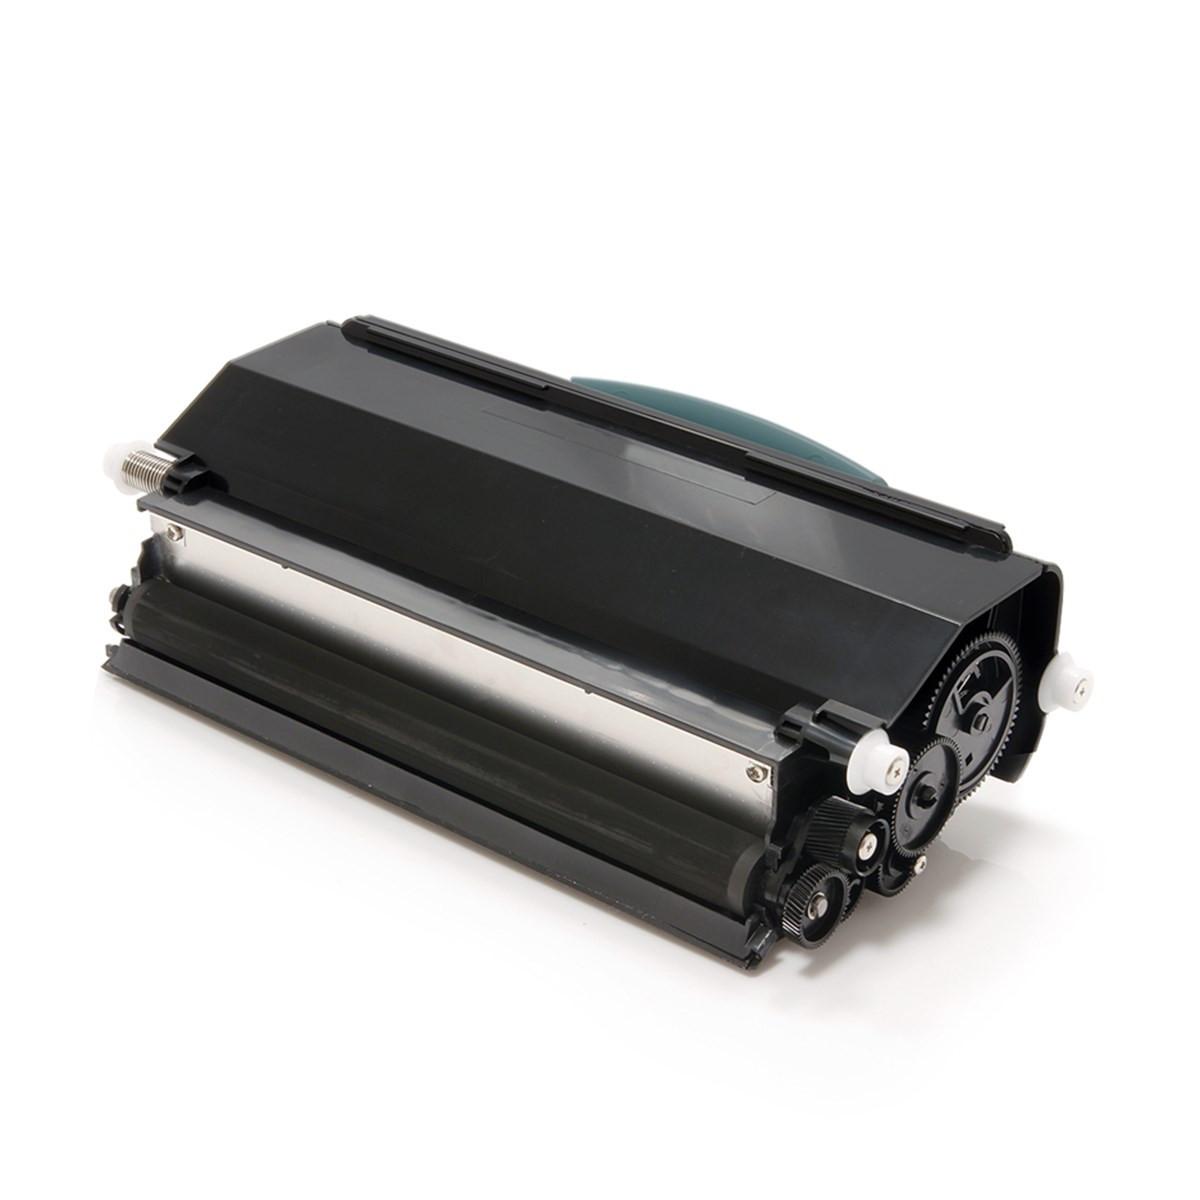 Toner Compatível com Lexmark E260 E360 E460 E460DN E360DN E260DN E260A11B | Importado 3.5k